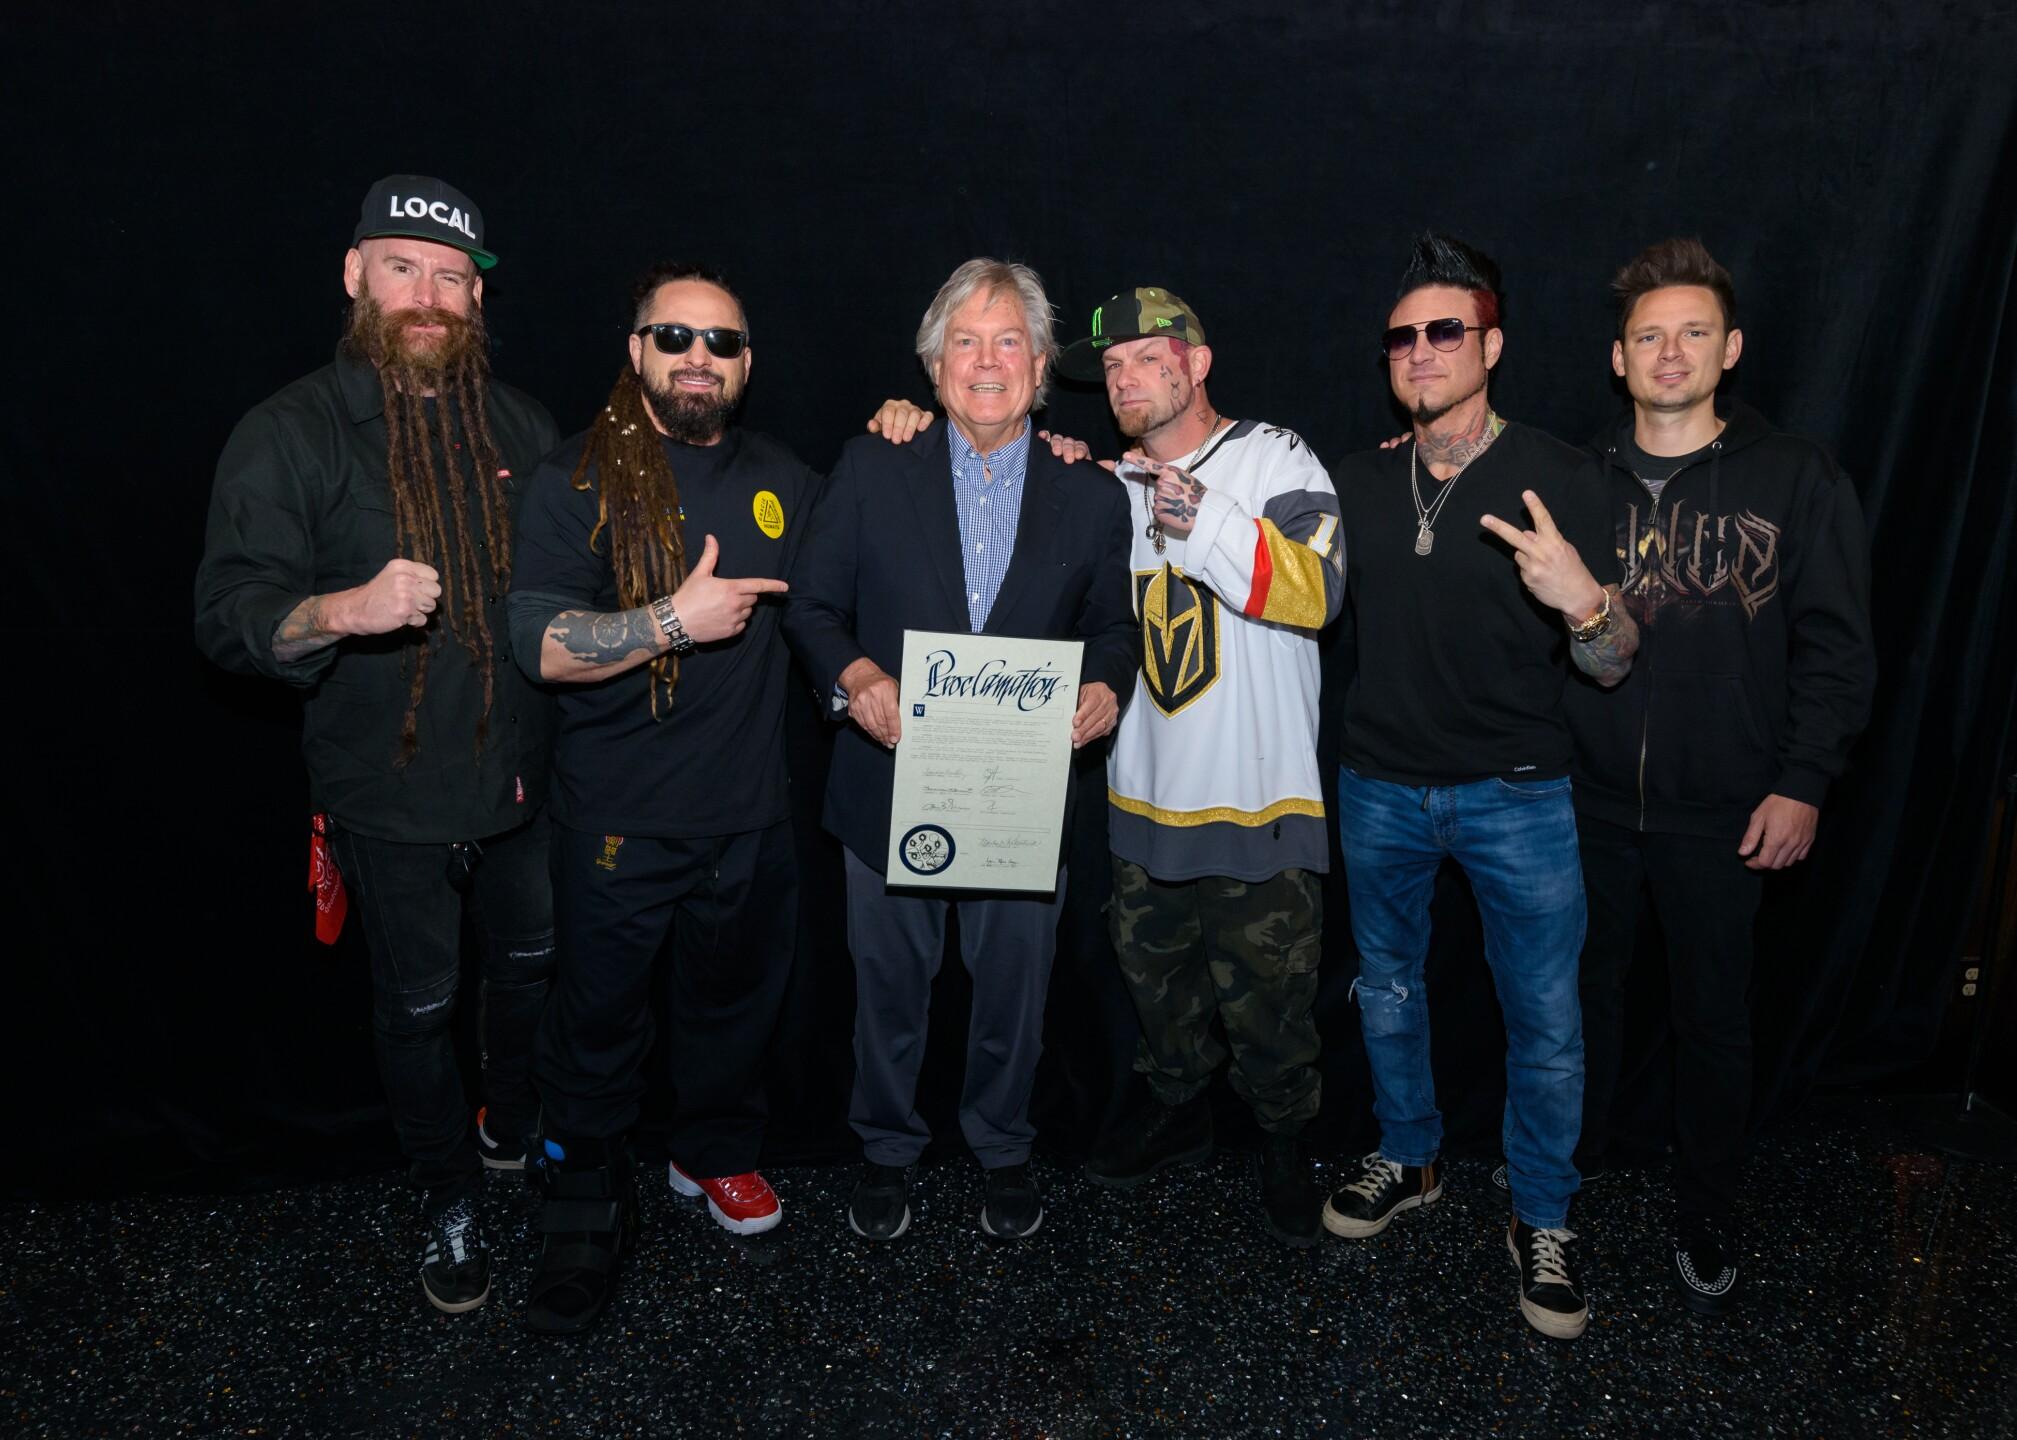 11_01_19_HRH_Five Finger Death Punch Case Unveil_Gray_KPG_18.jpg